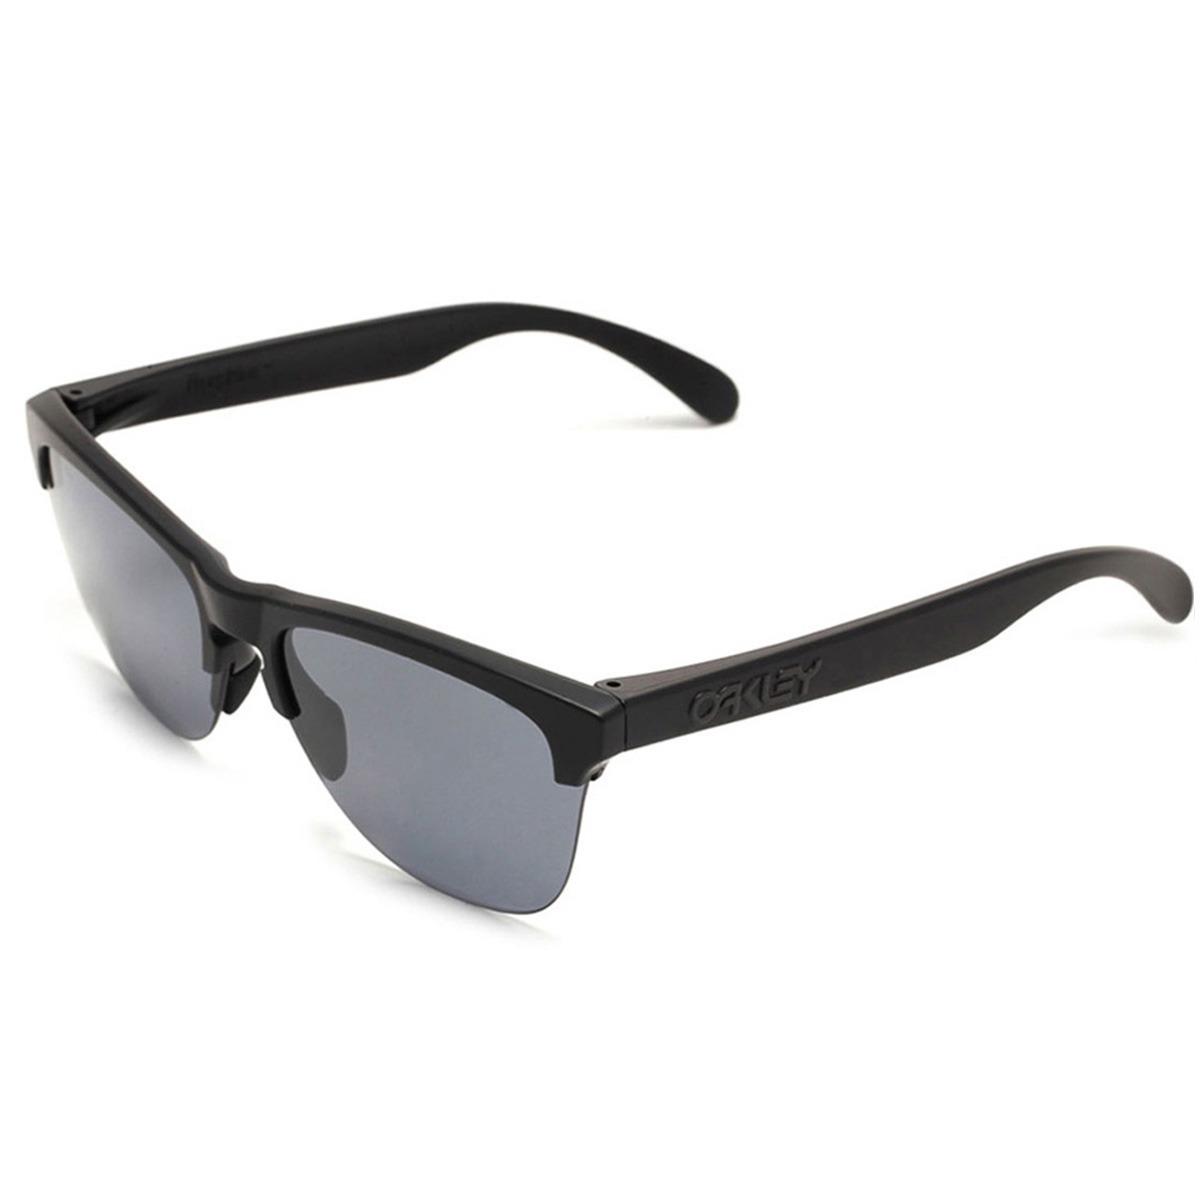 ccdad760c Óculos Oakley Frogskins Lite Matte Black/ Lente Grey - R$ 449,90 em ...